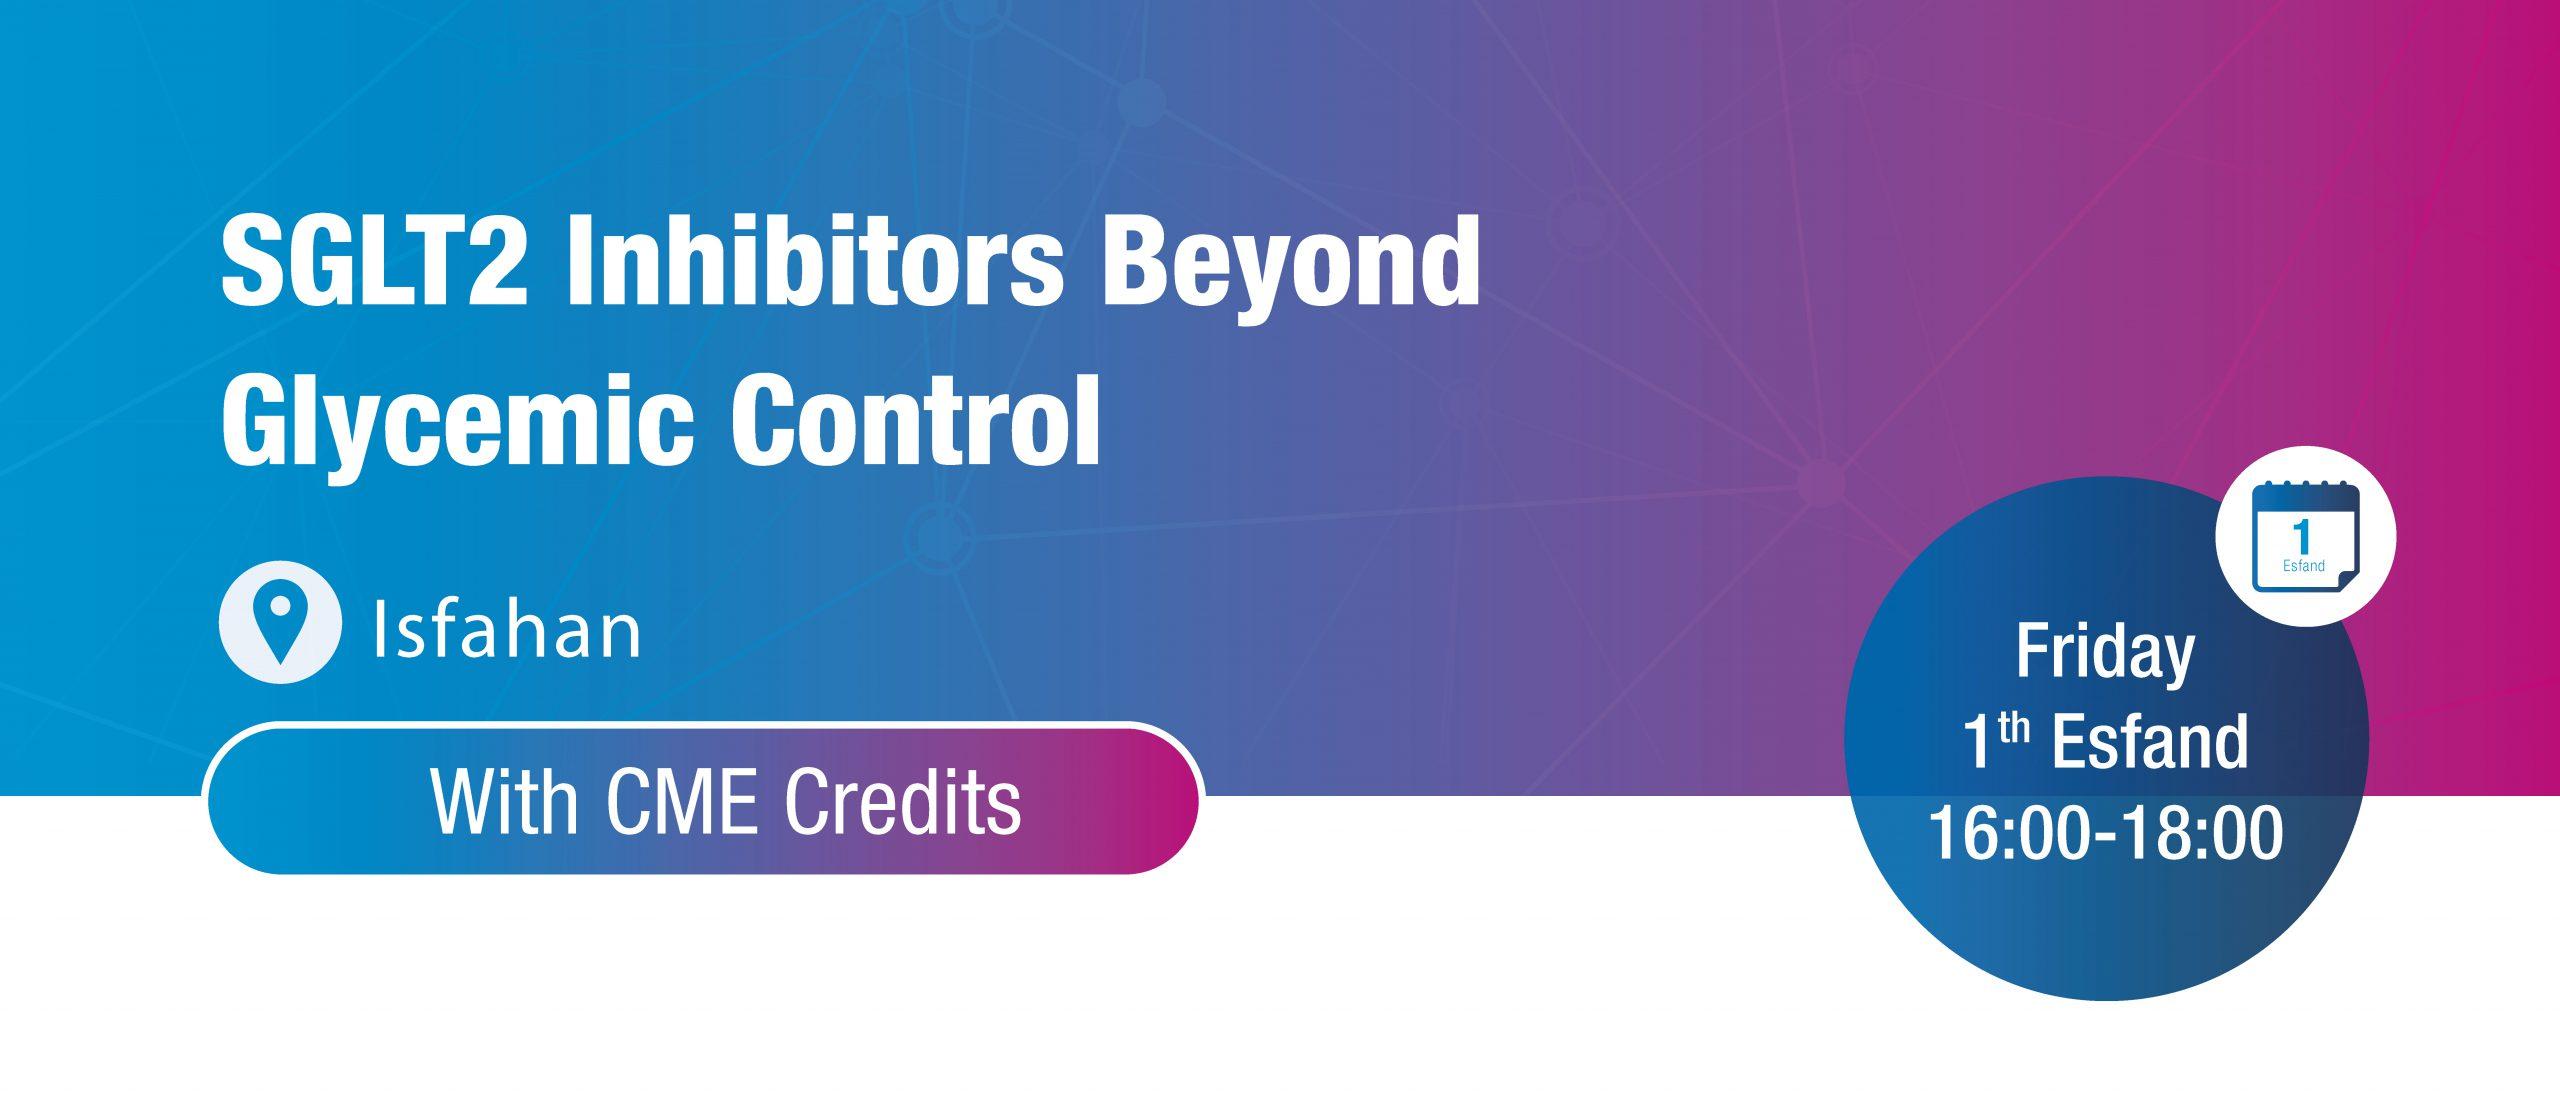 SGLT2 Inhibitors Beyond Glycemic Control